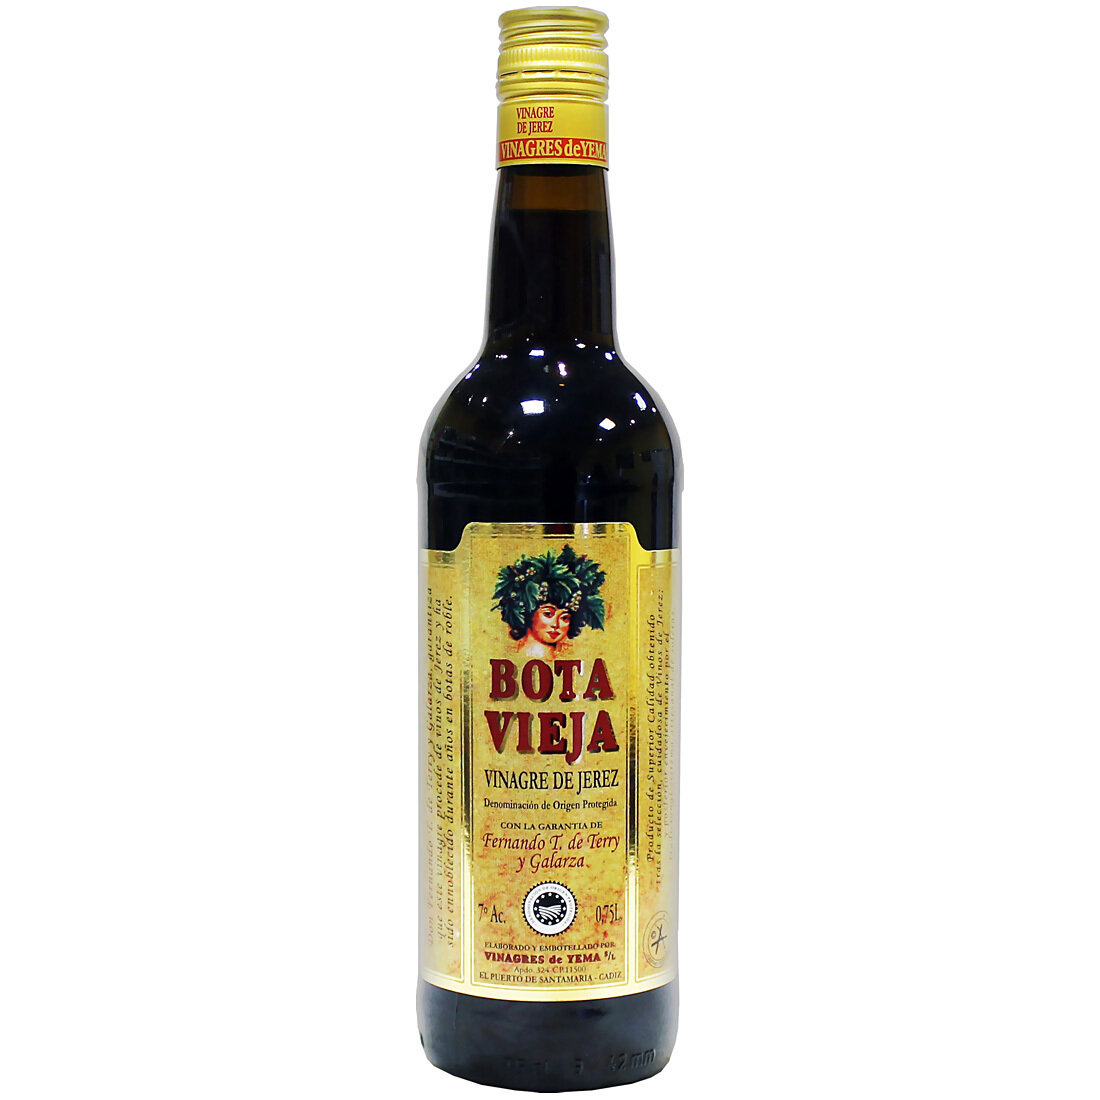 Sherryviinietikka Bota Vieja D.O.P. Reserva | Sherry Vinegar Bota Vieja | VINAGRES DE YEMA S.L. | 750 ML